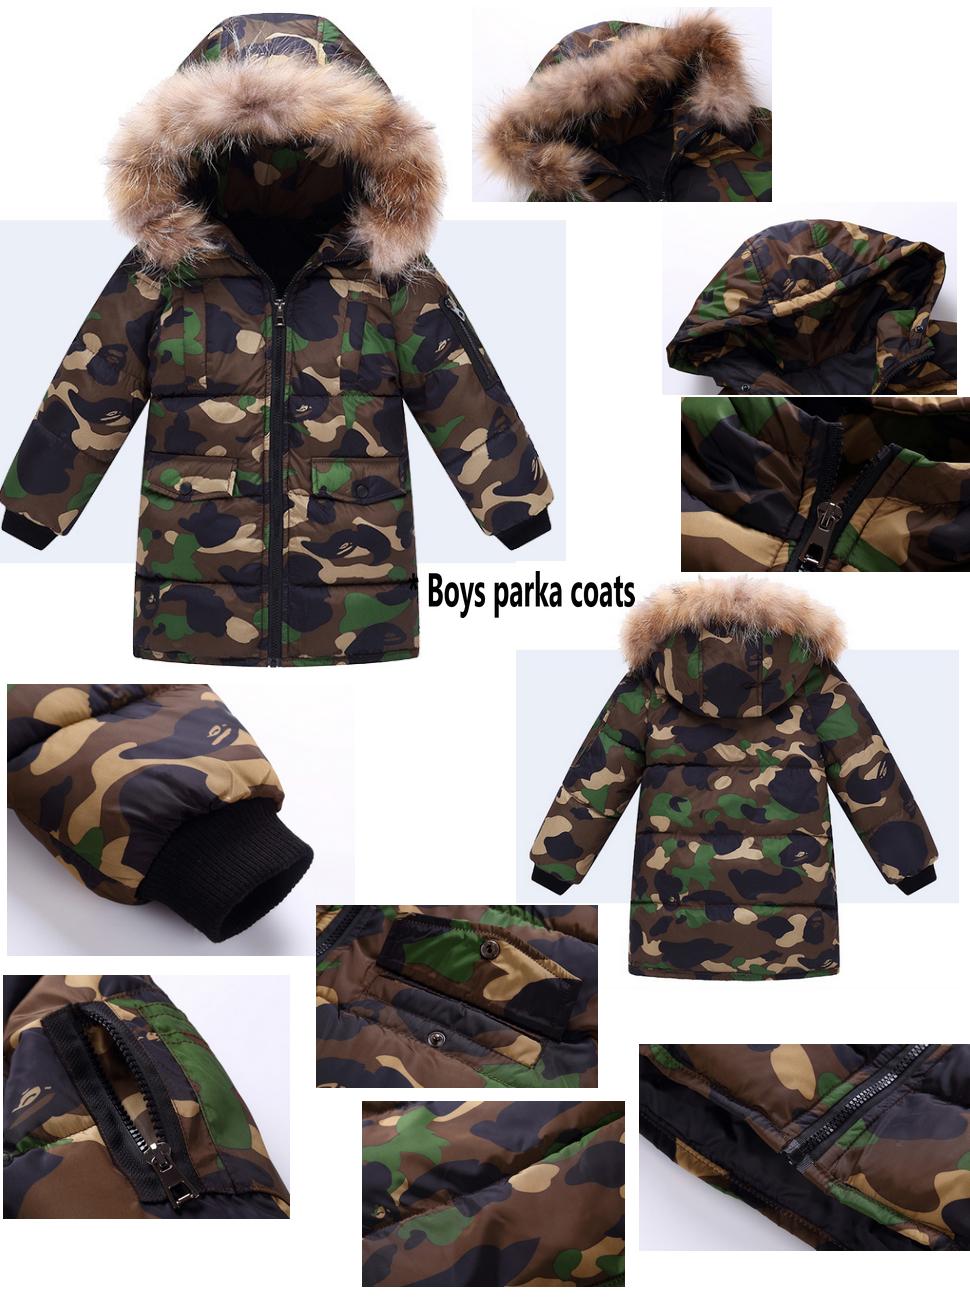 7f92f628ece2 OCHENTA Kids Boys Winter Padded Camo Jacket Coat with Faux Fur Hood ...